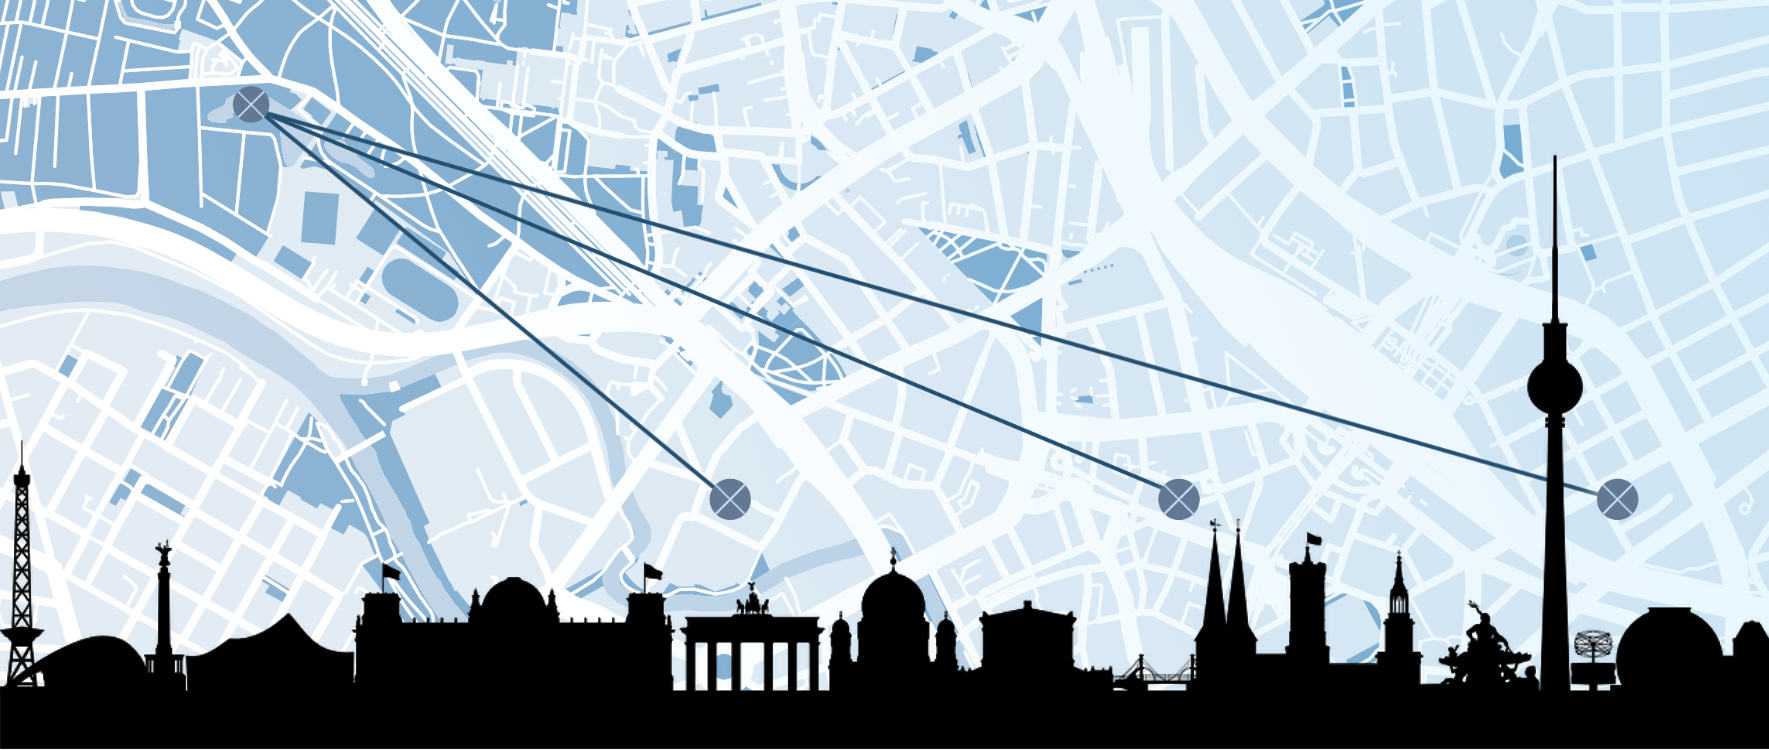 Messe 2020 in Berlin